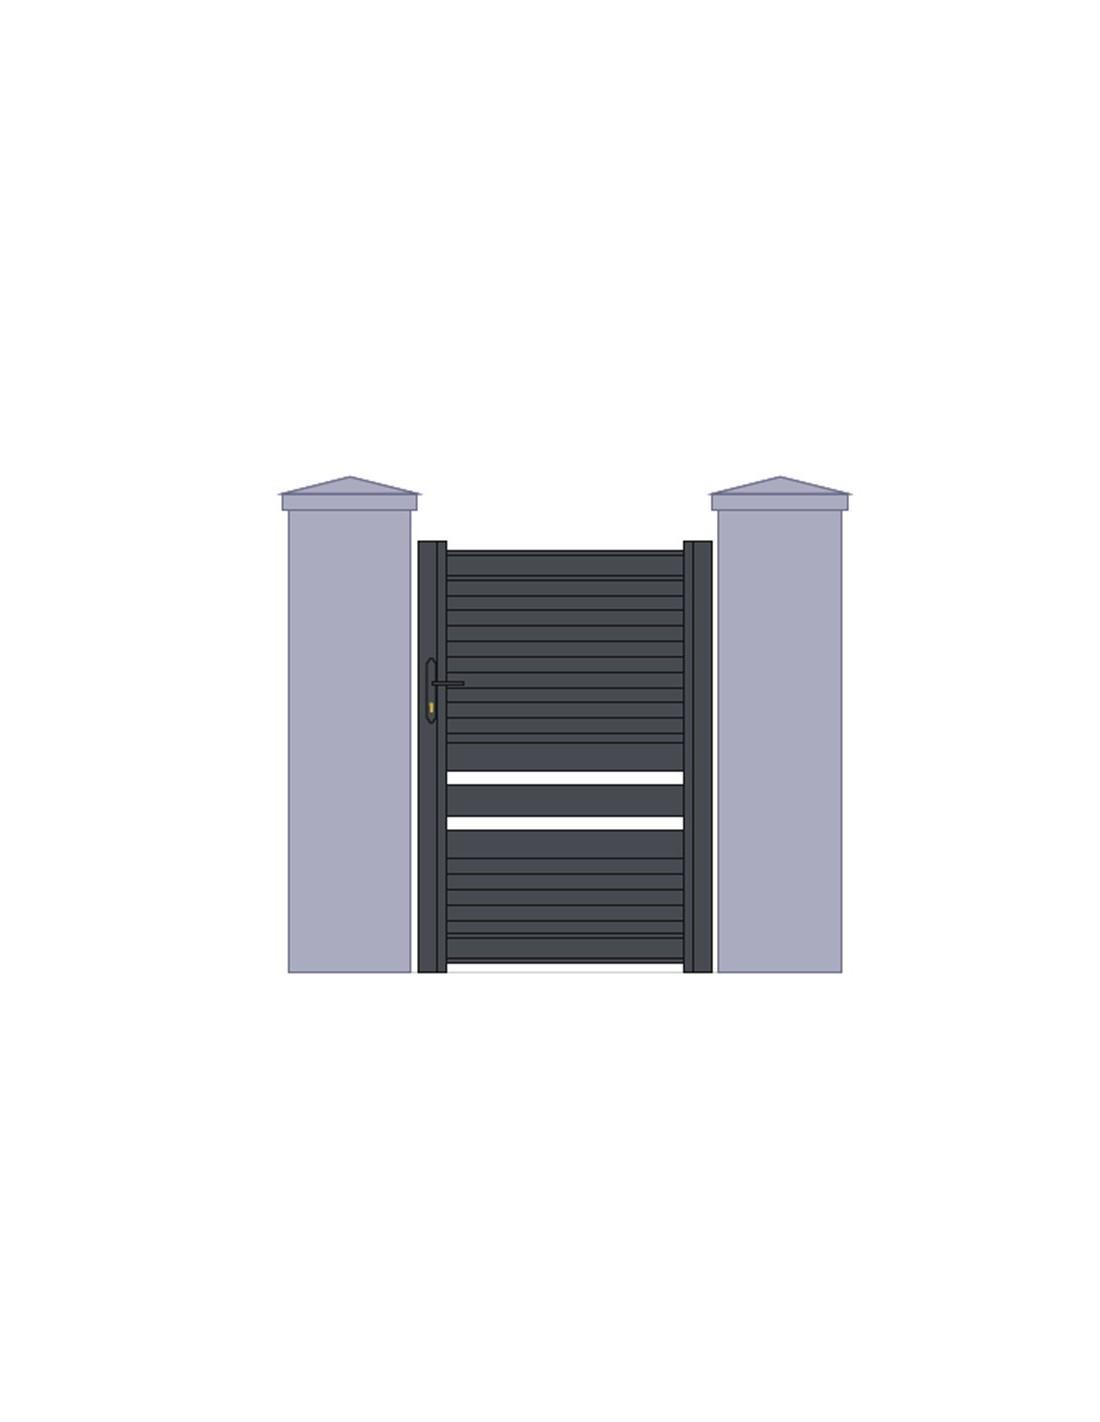 Portillon aluminium design mod le montauban sur mesure for Prix menuiserie alu sur mesure